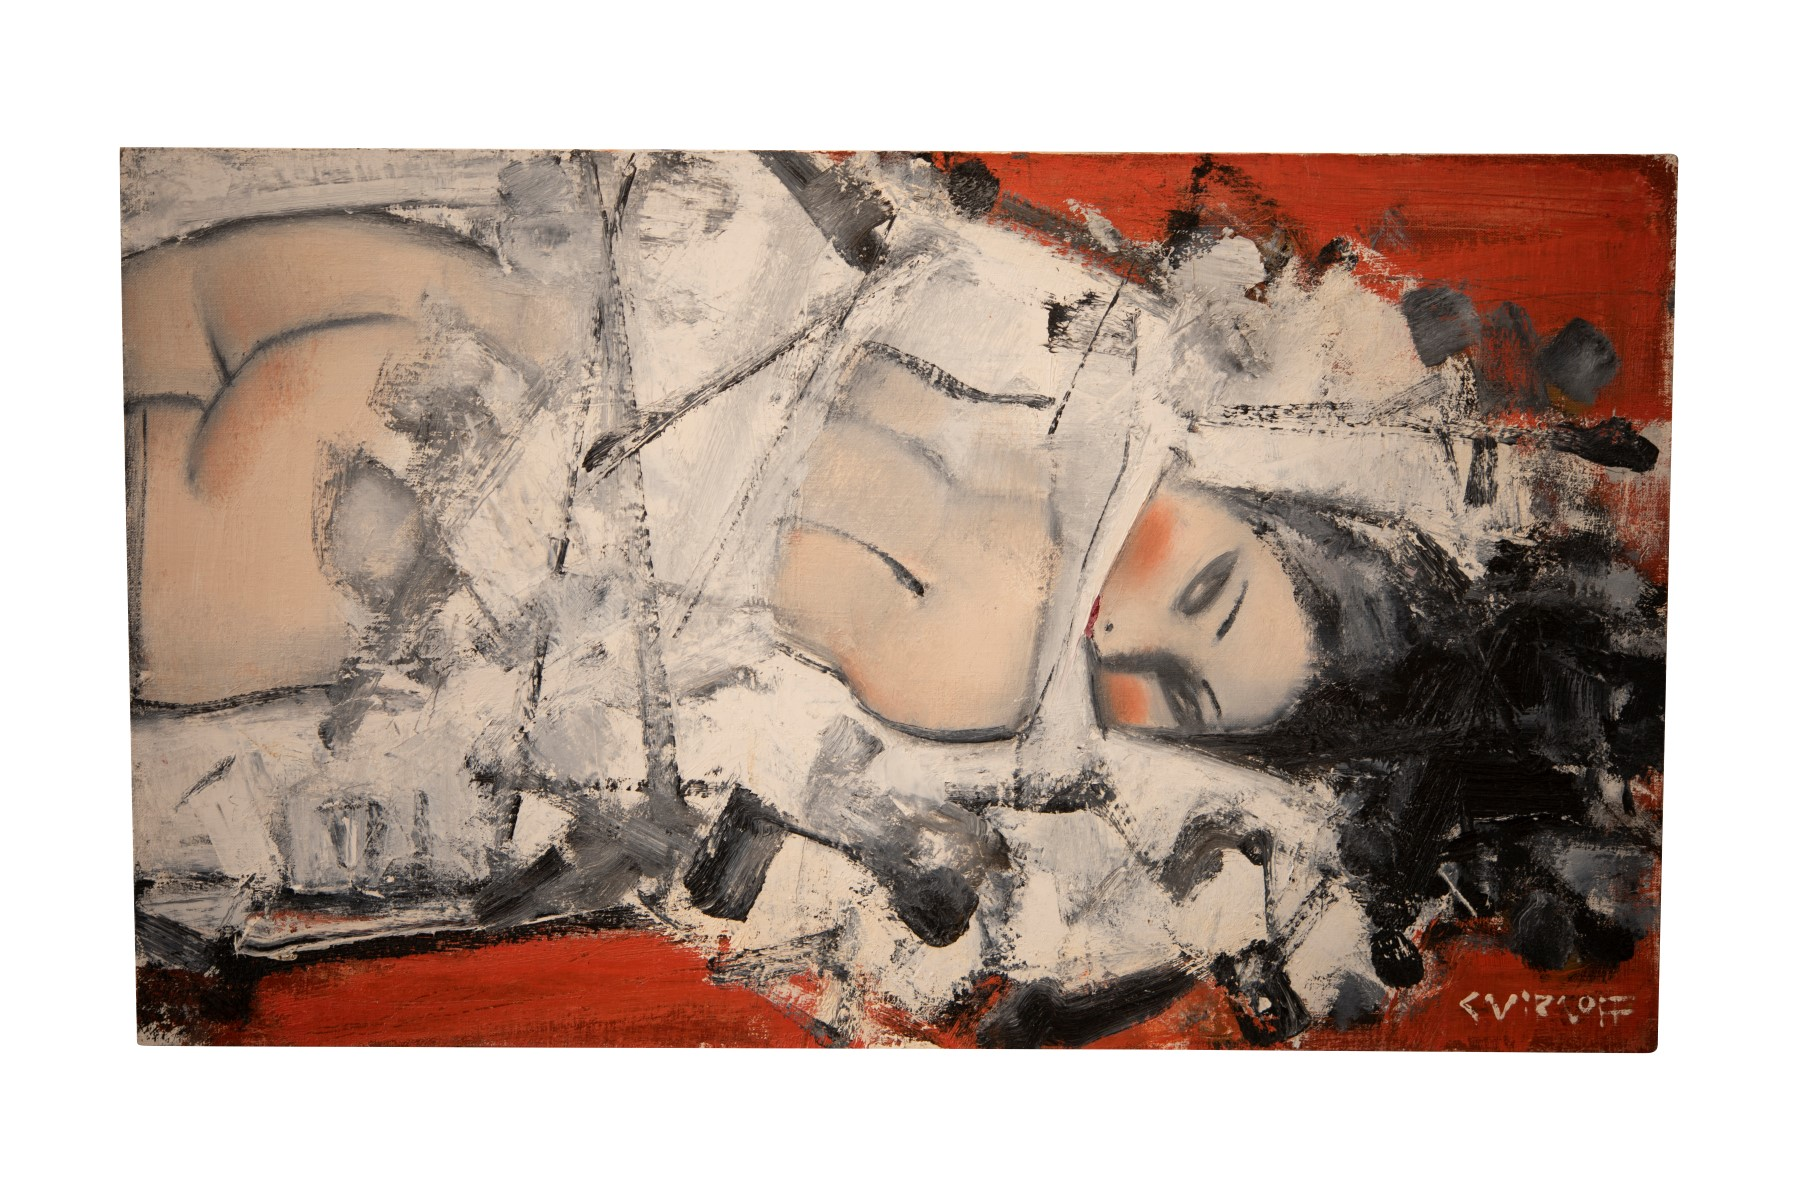 #176 Andrai Smirnoff (1960), Italien Noon   Andrai Smirnoff (1960), Italien Noon Image